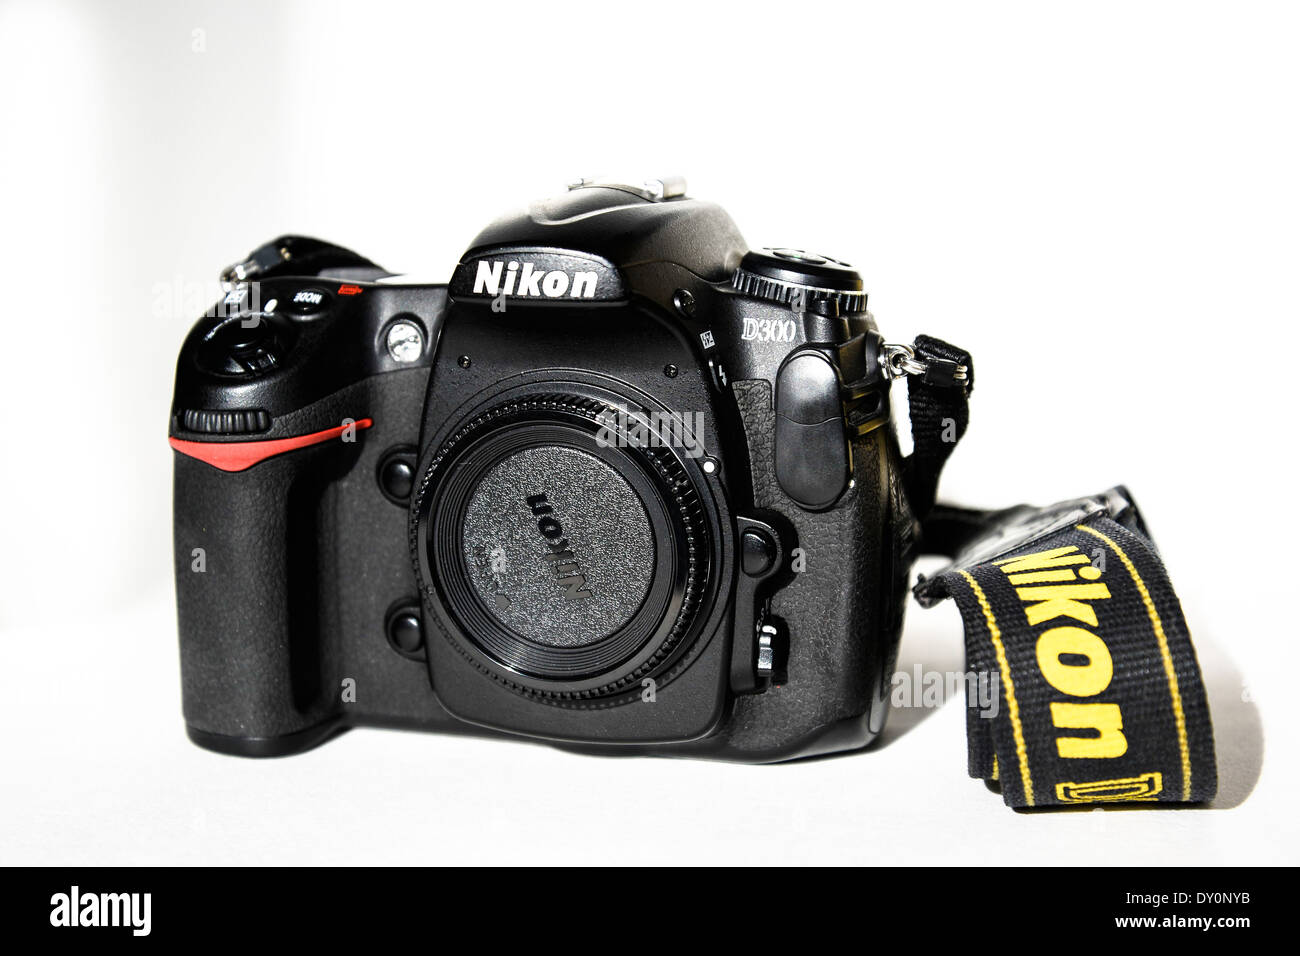 Dslr Nikon Imágenes De Stock & Dslr Nikon Fotos De Stock - Alamy